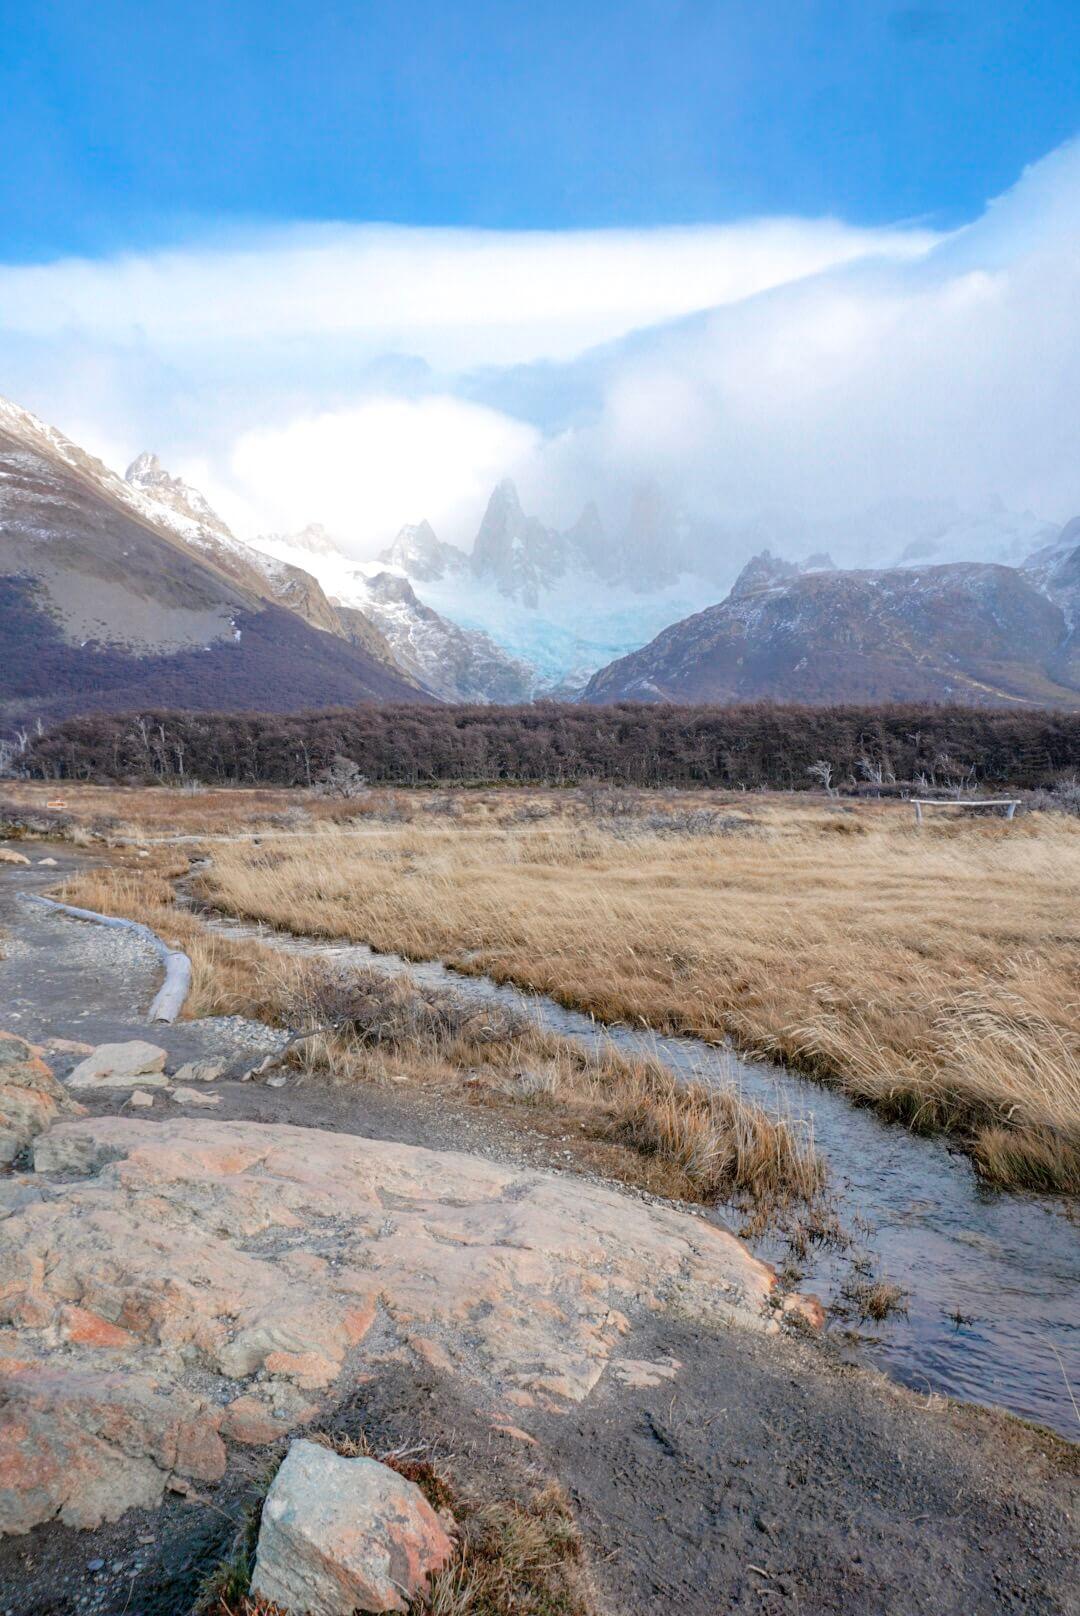 randonnée patagonie argentine